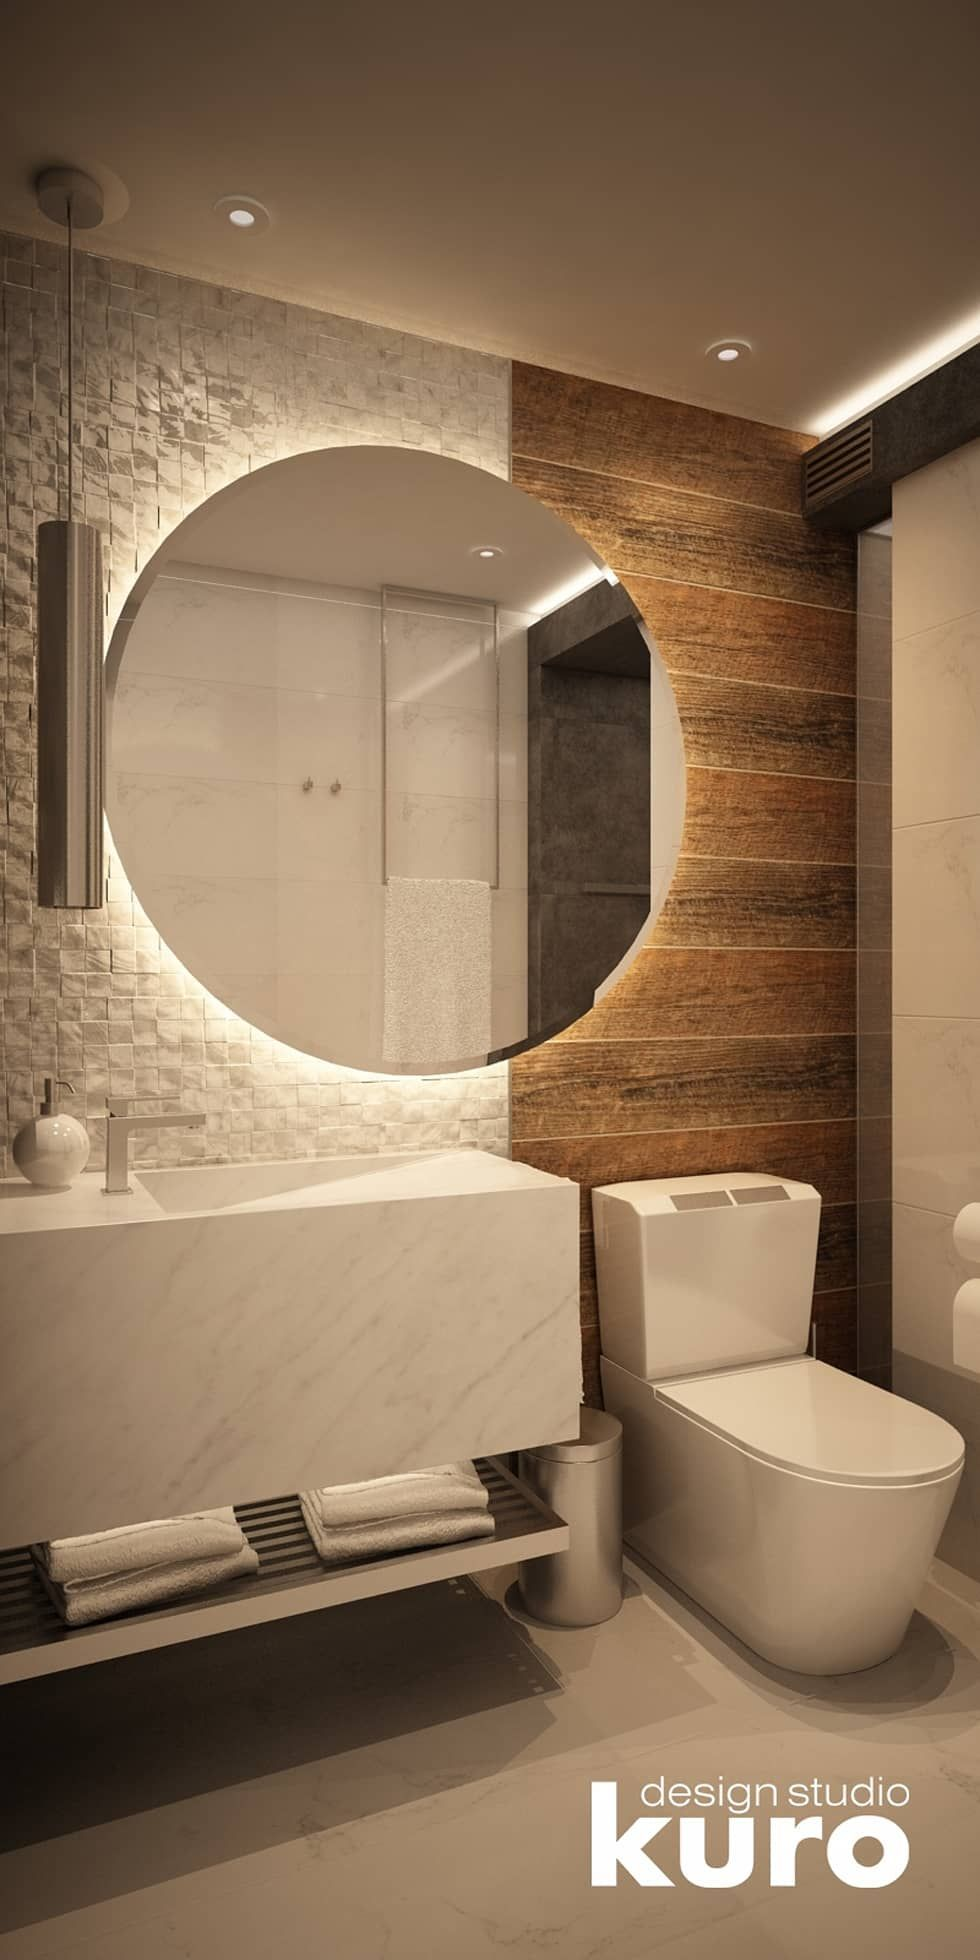 A Comprehensive Overview On Home Decoration En 2020 Banos De Lujo Decoracion De Banos Modernos